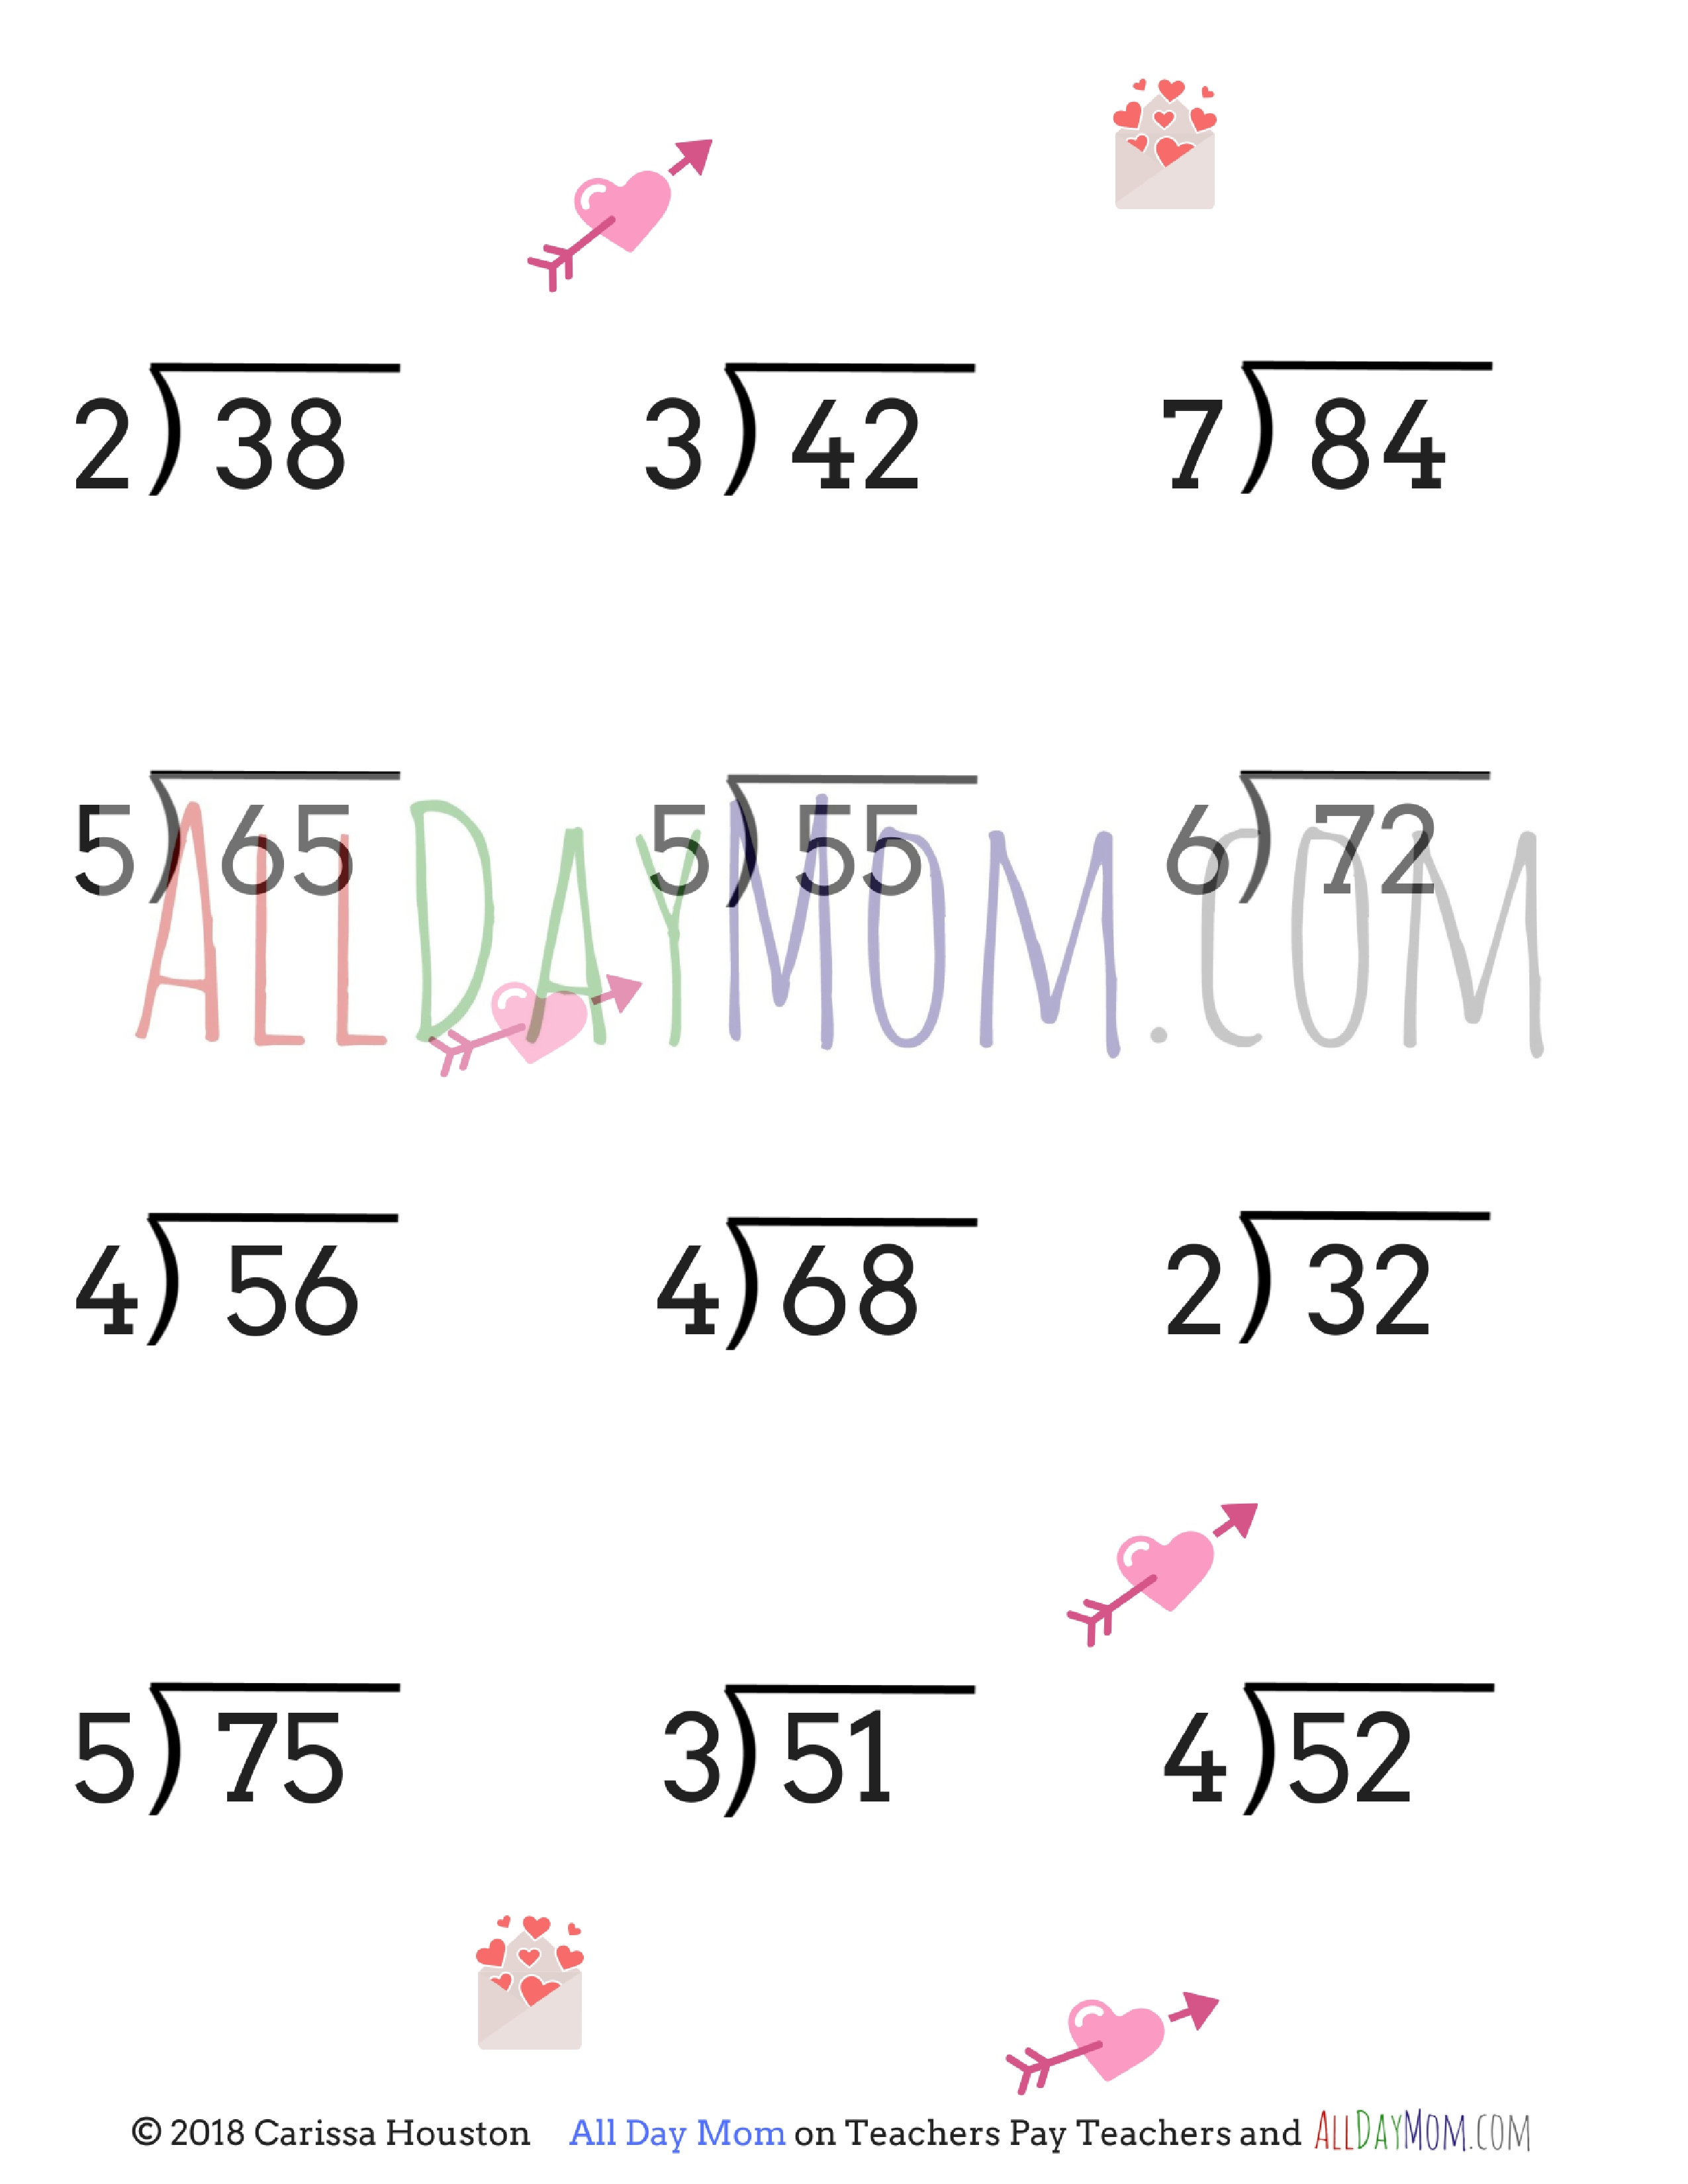 Free printable Valentine's Day math worksheets!